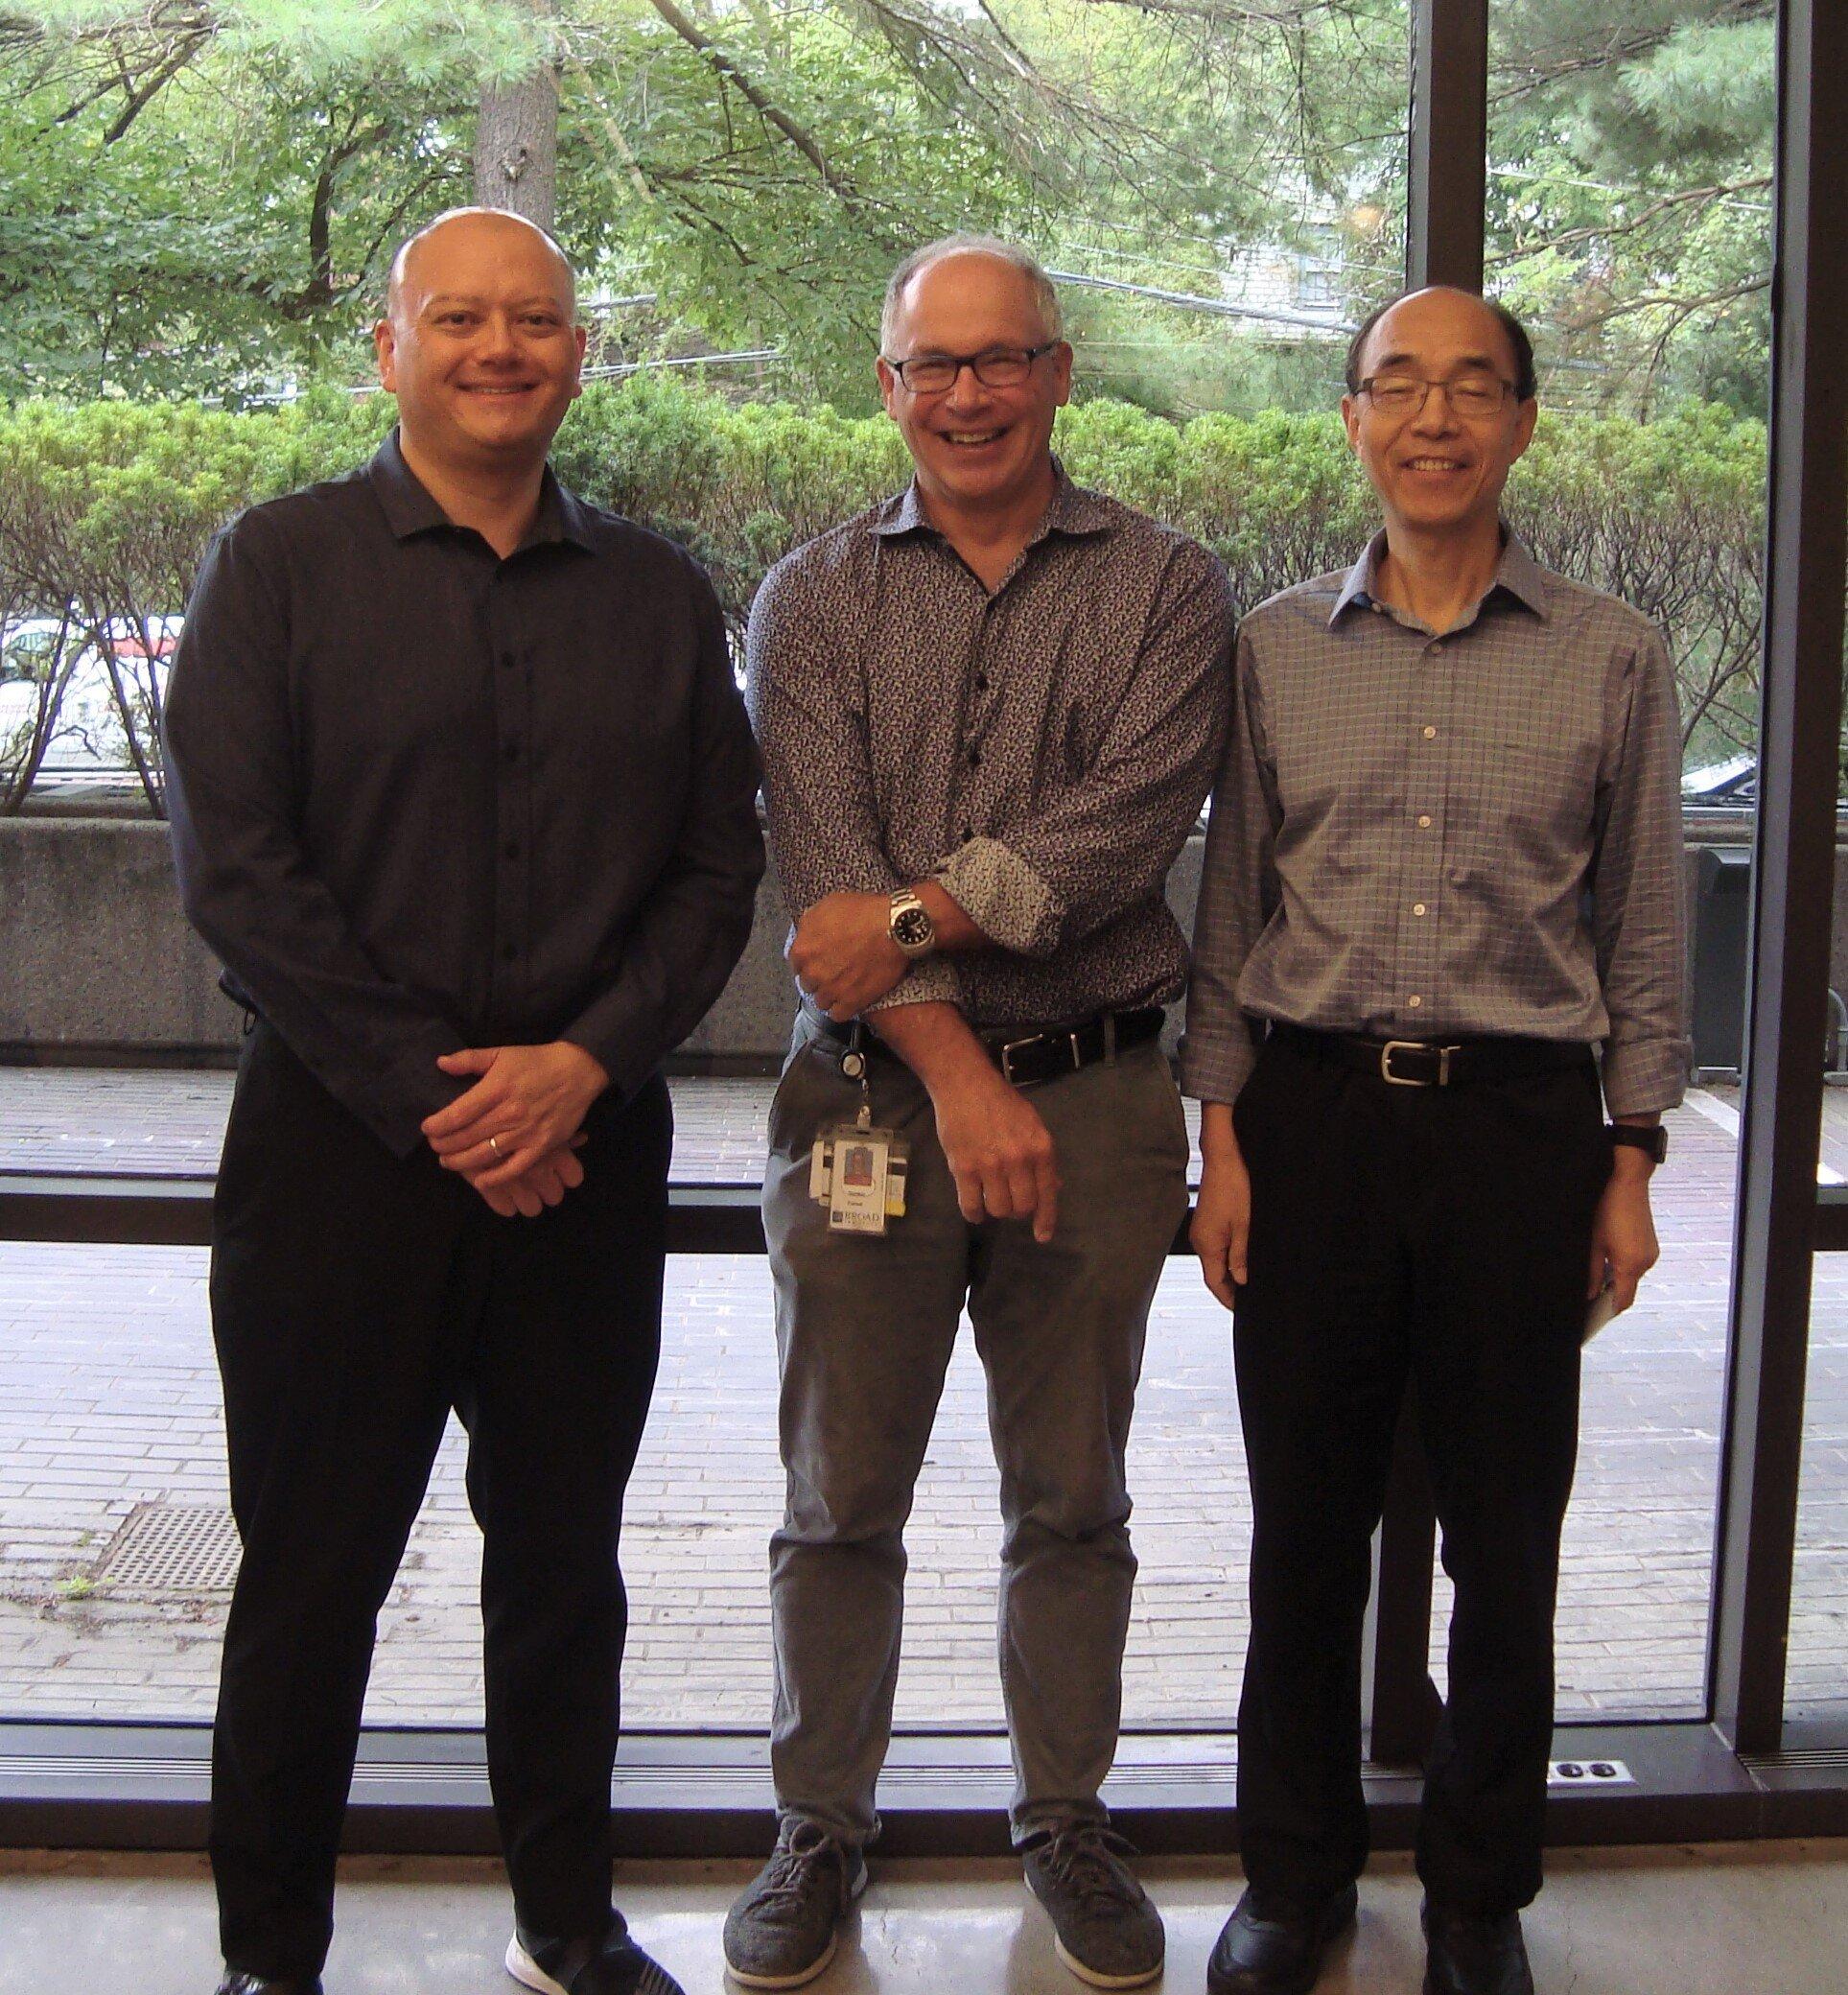 Conte 2019 Retreat: Drs. Hensch, Fishell, Feng